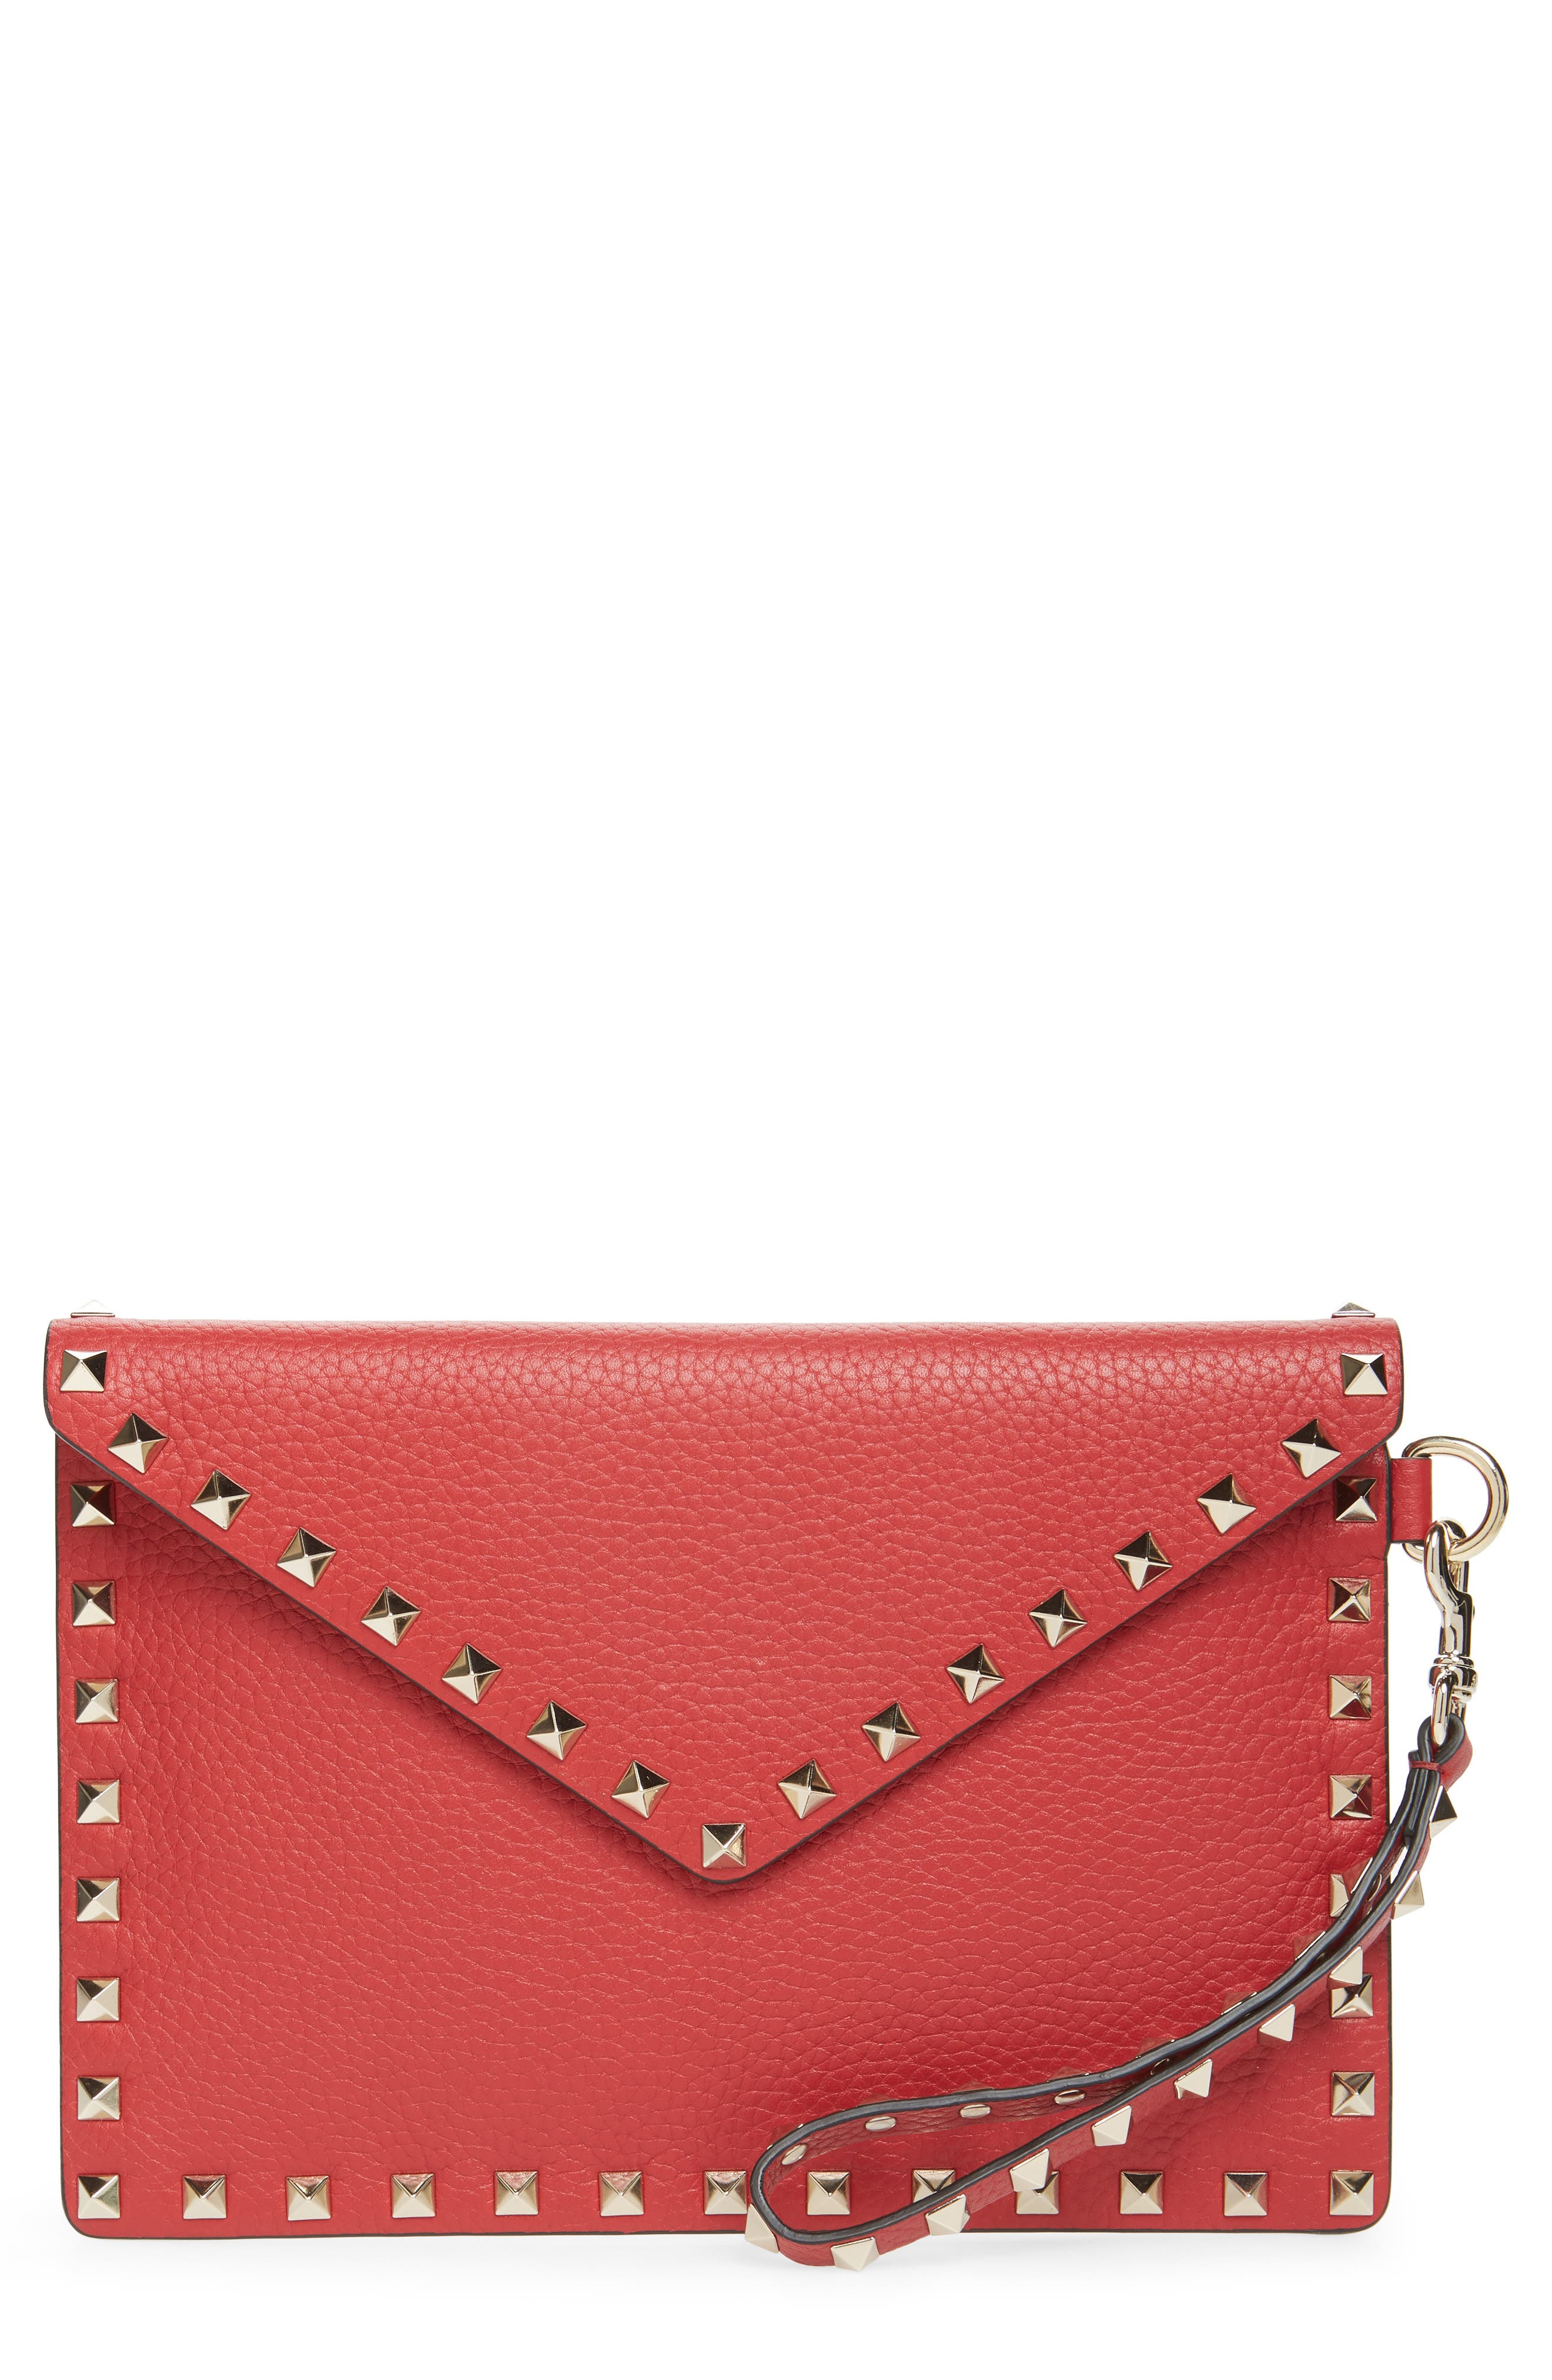 Medium Rockstud Leather Envelope Pouch,                         Main,                         color, ROSSO V